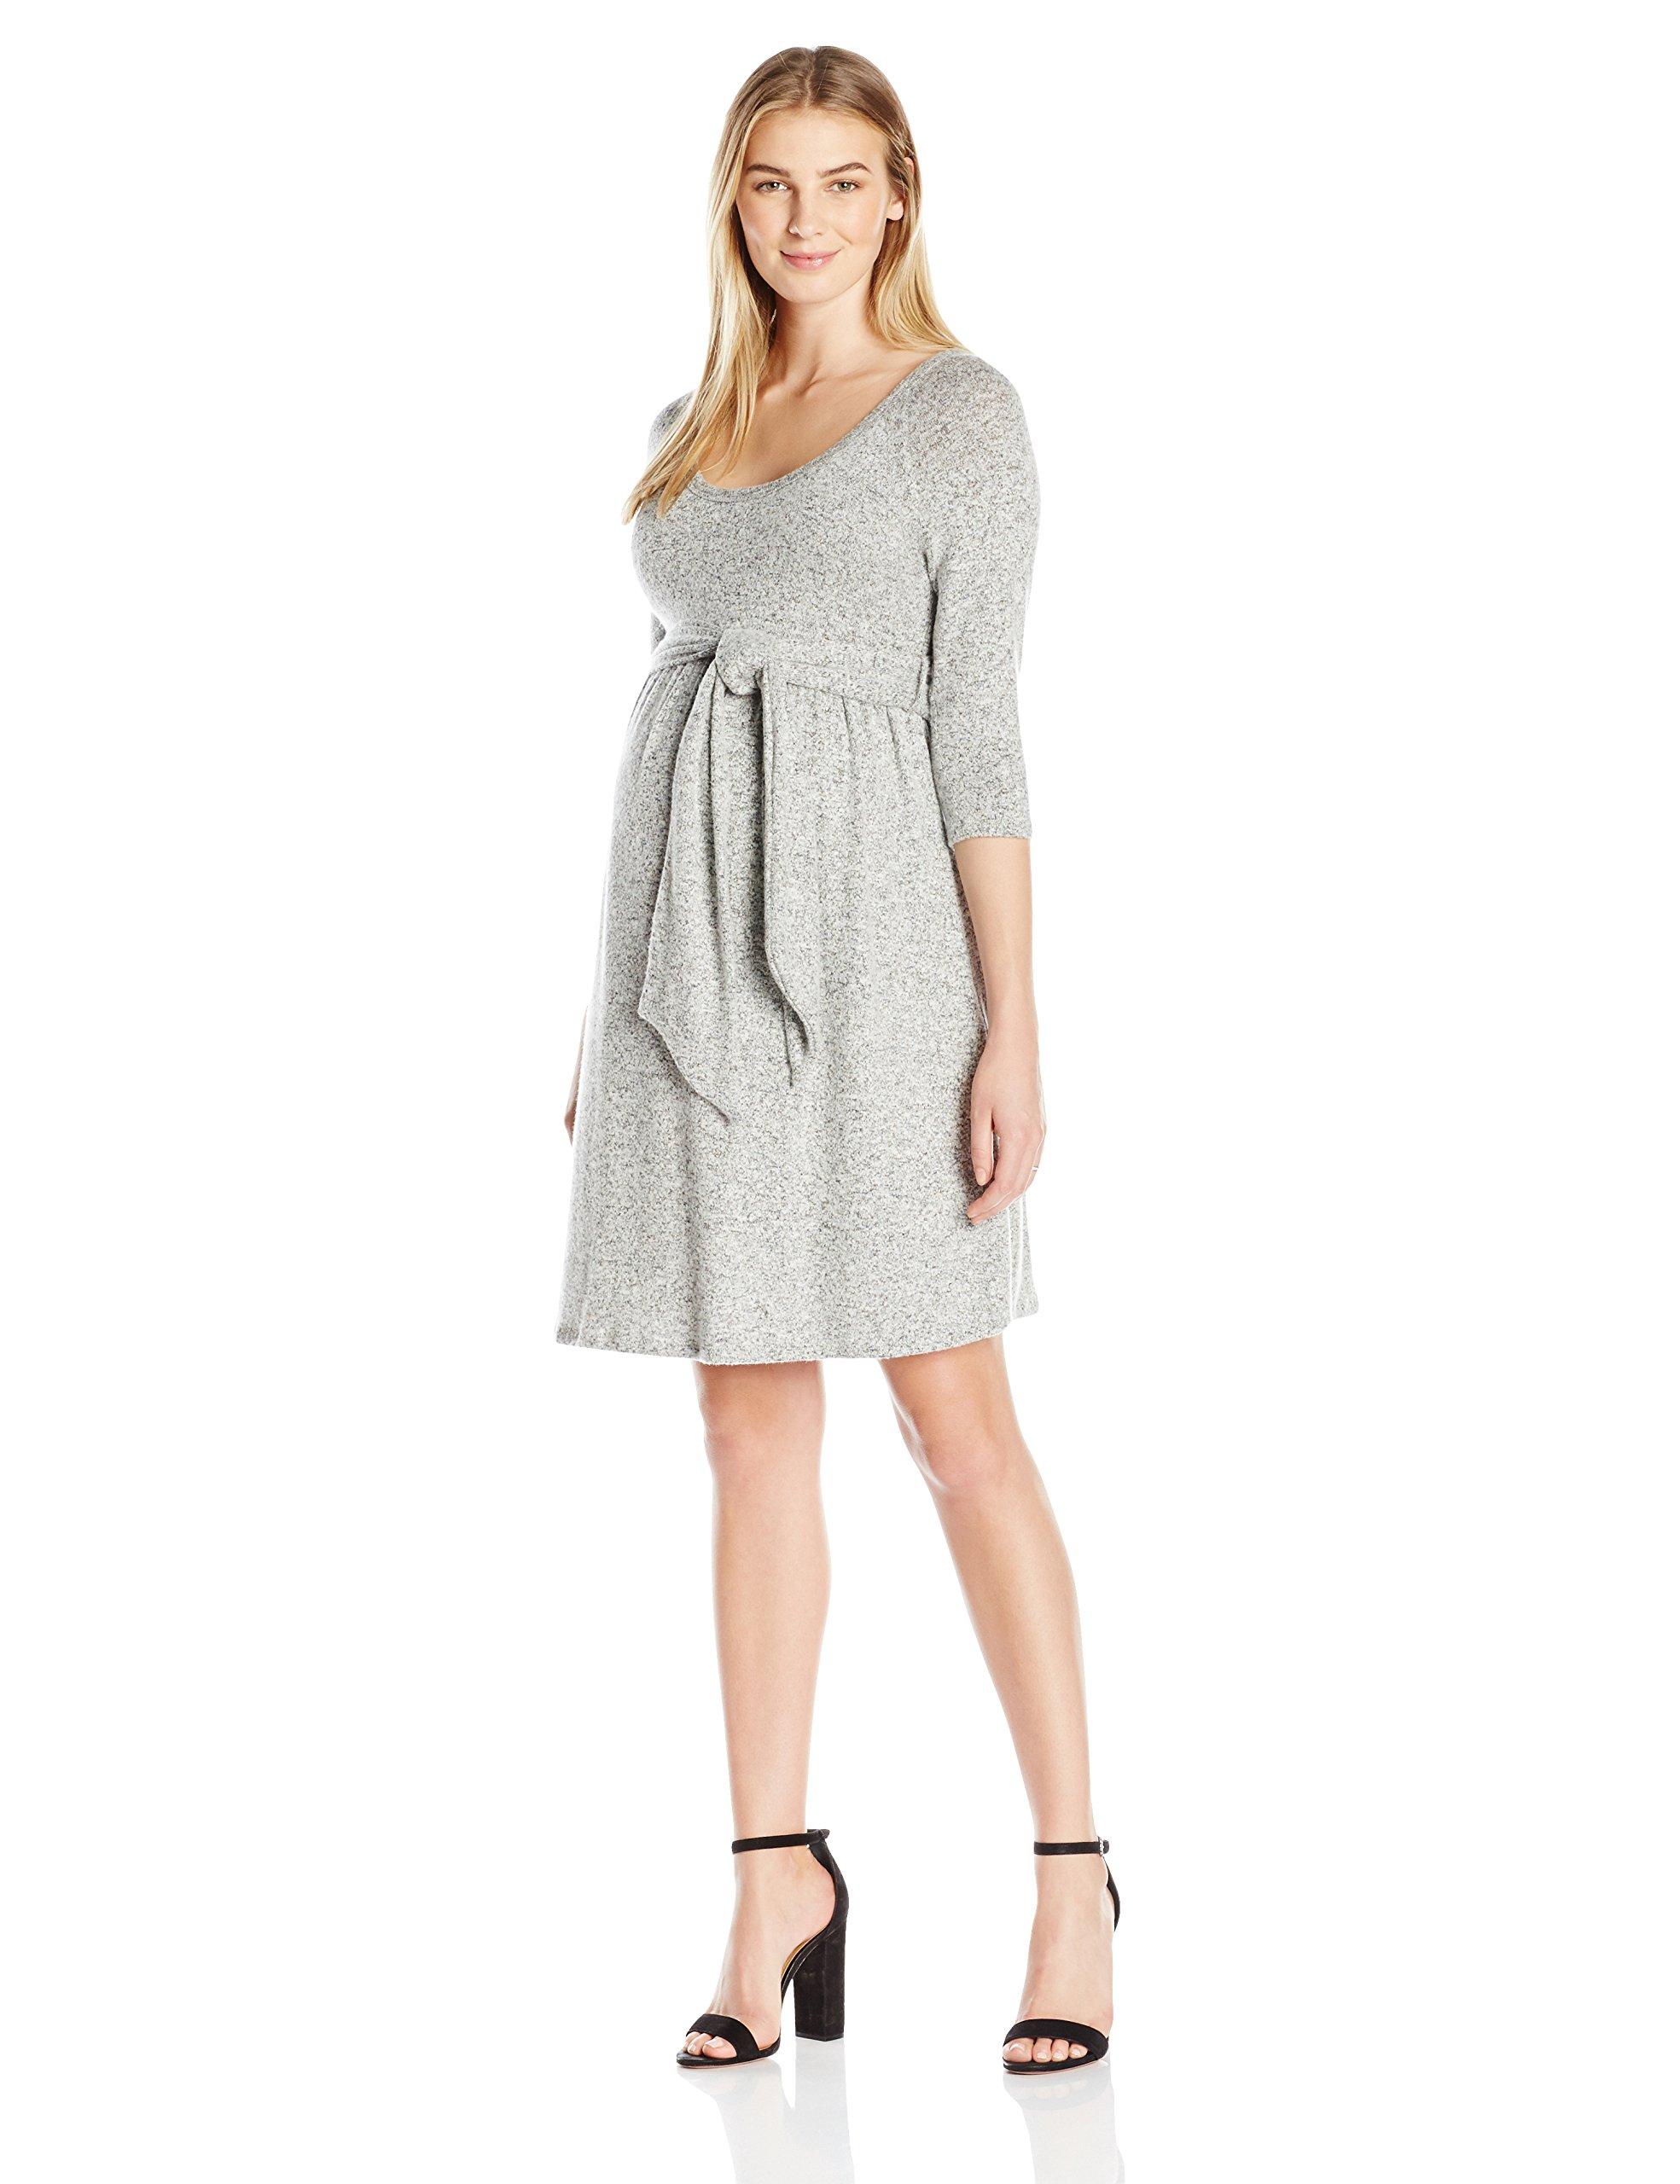 Maternal America Women's Maternity Scoop Neck Front Tie Dress, Grey, LARGE